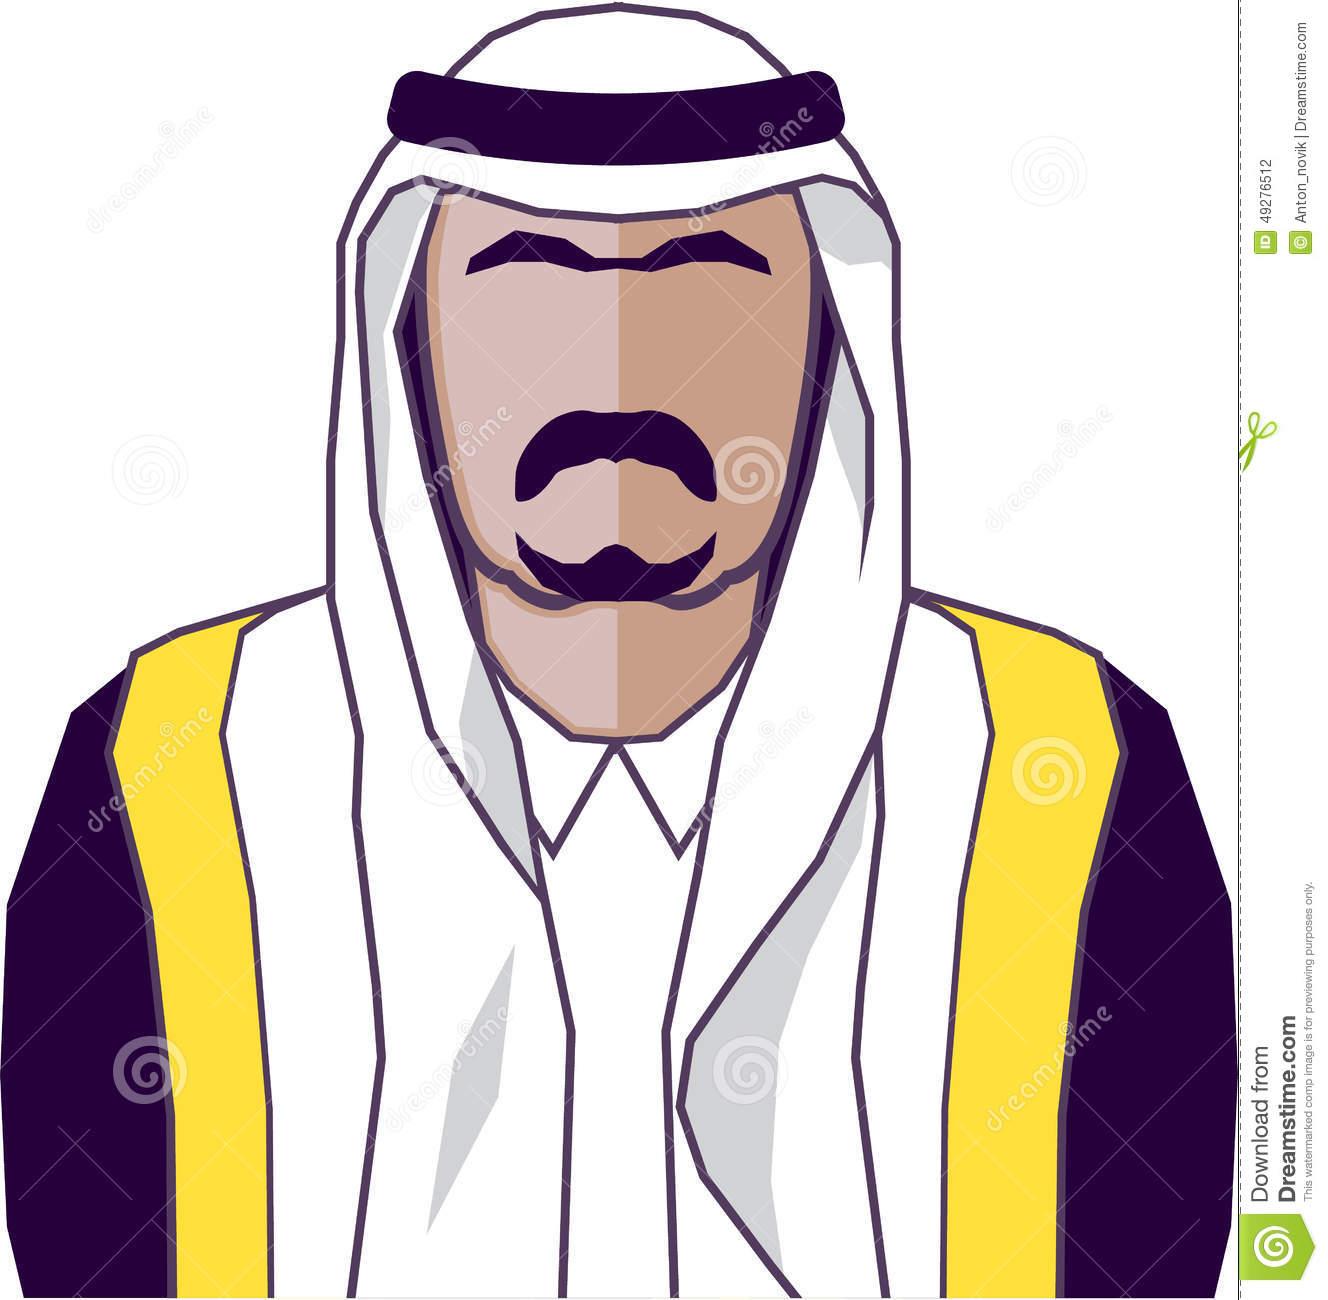 Arabic man clipart. Face for clipartfest arab